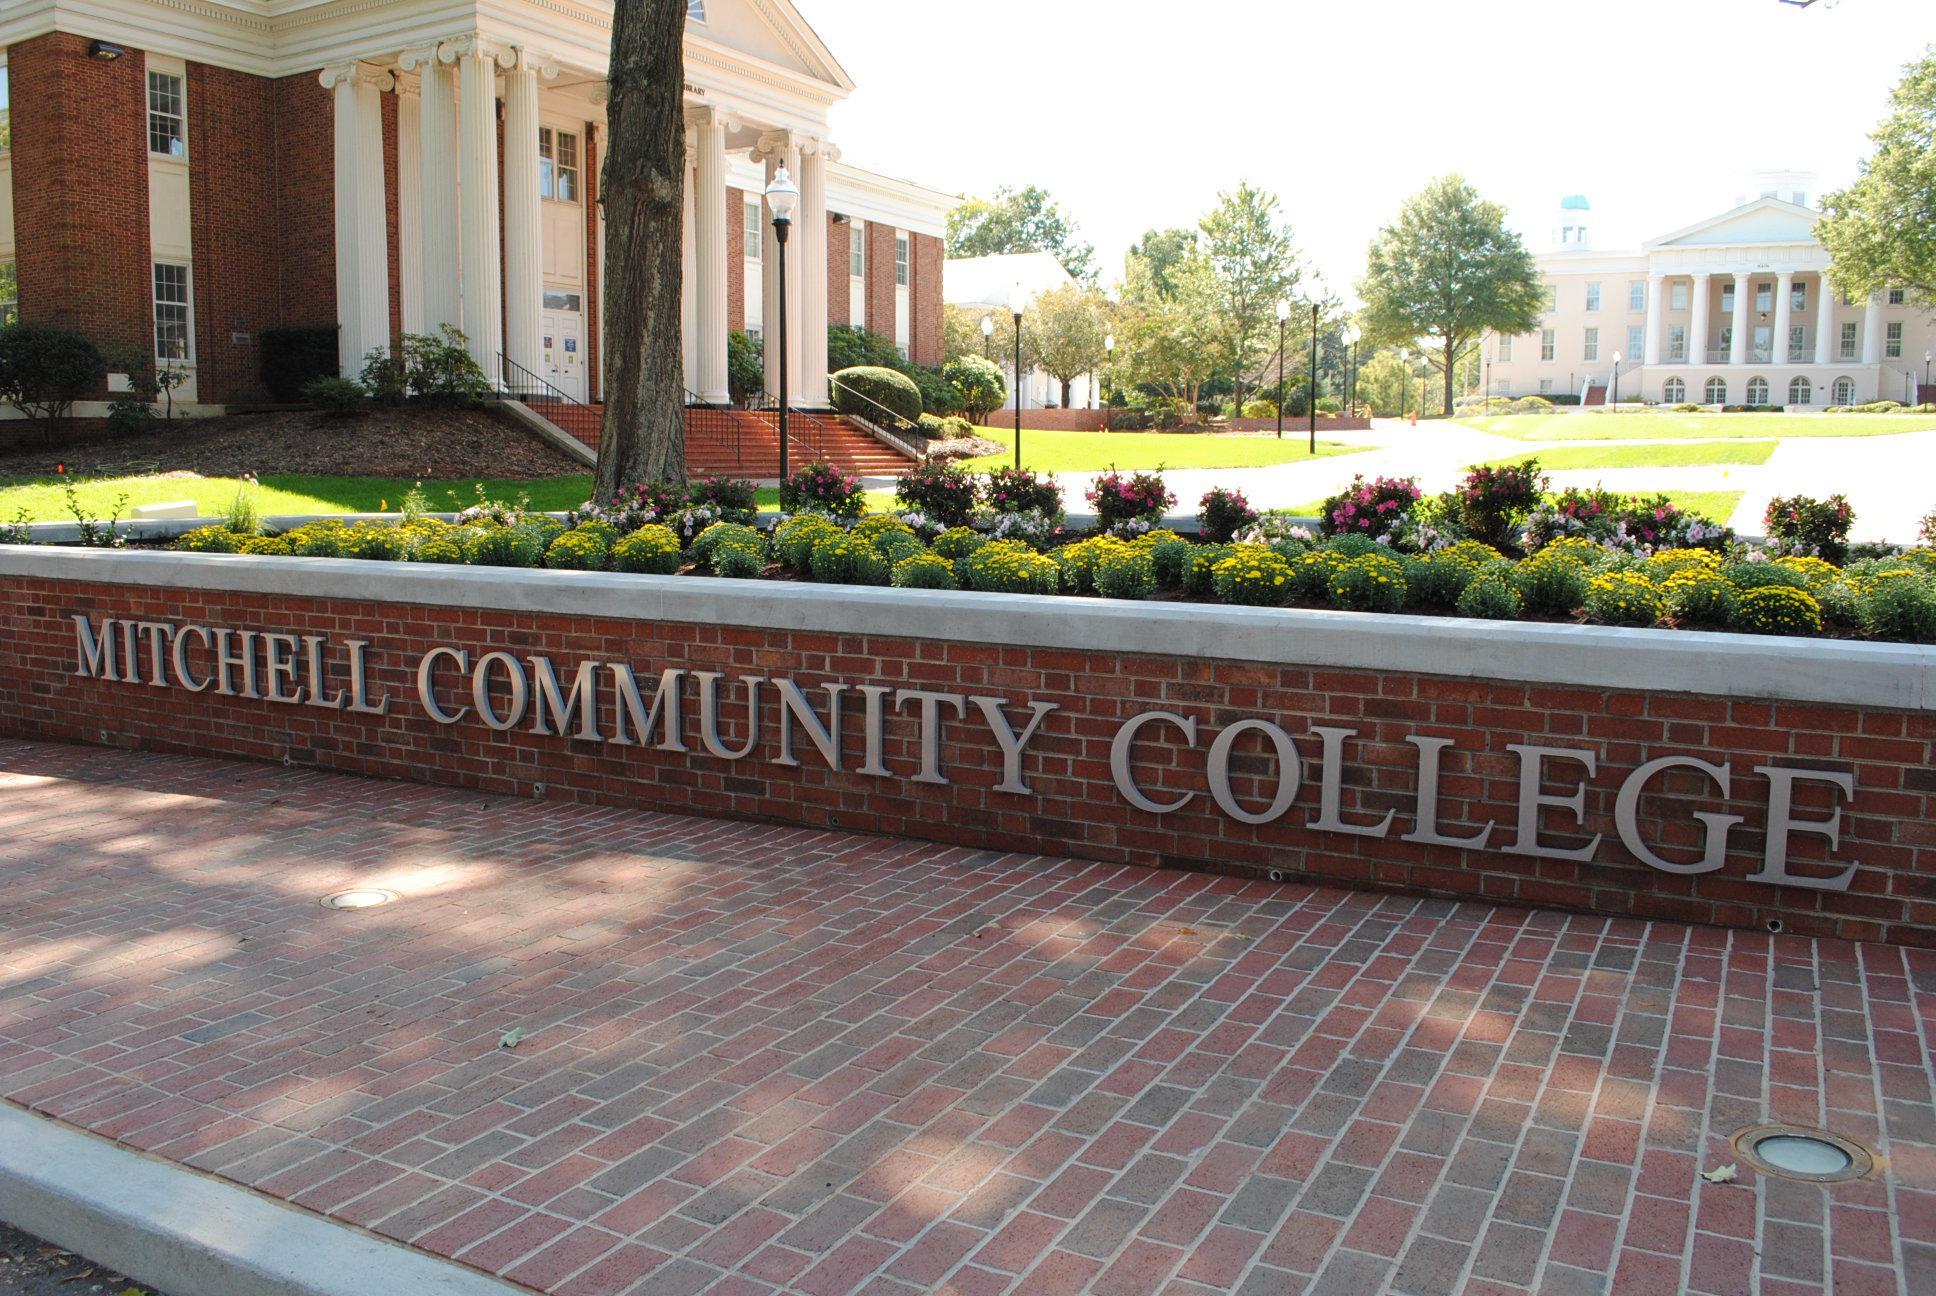 Mitchell Community College's historic Statesville Campus